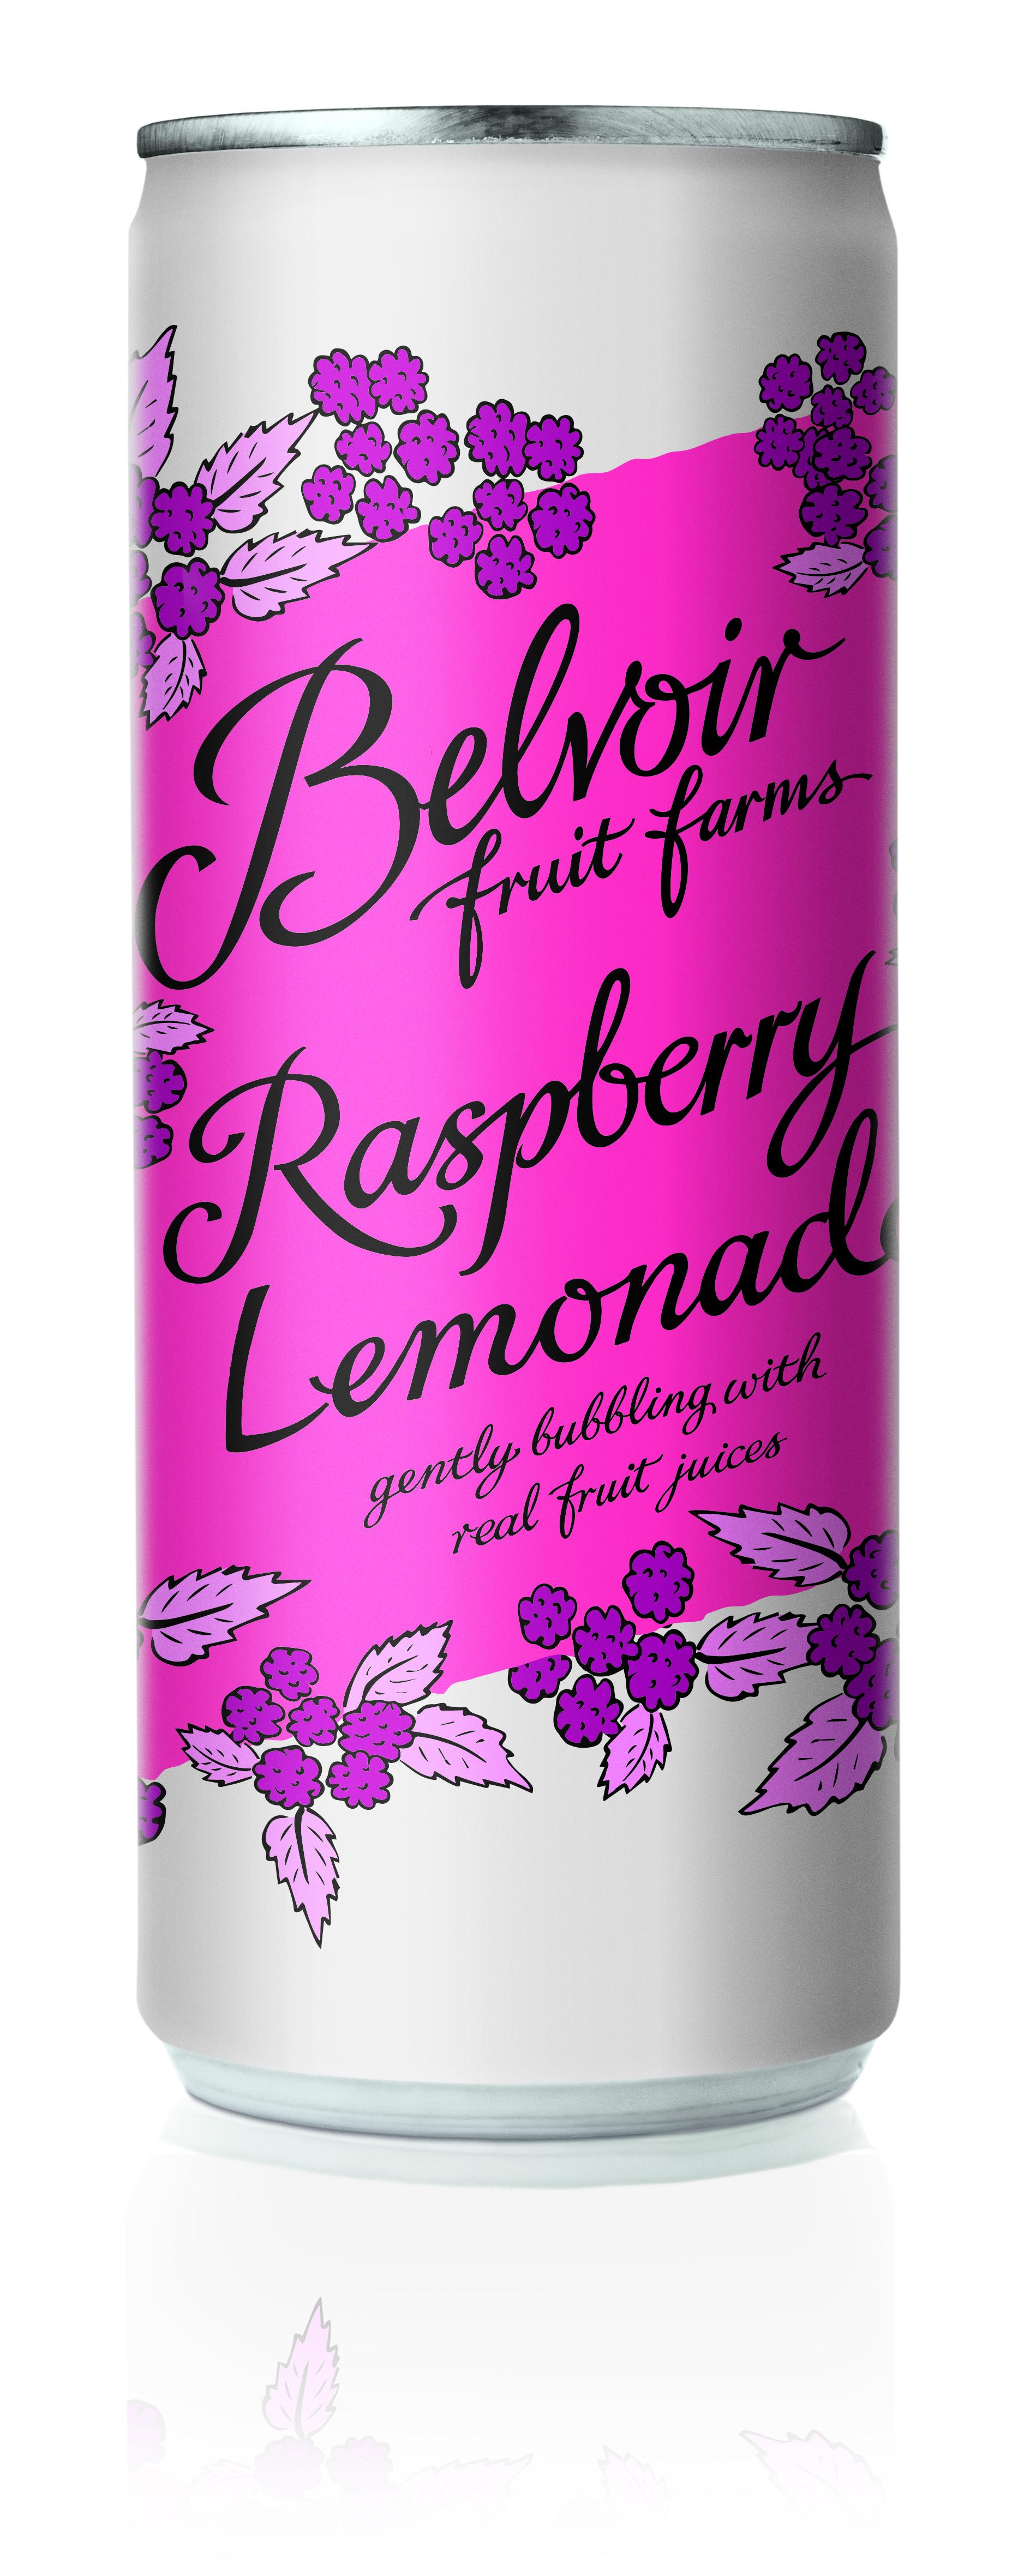 Raspberry Lemonade